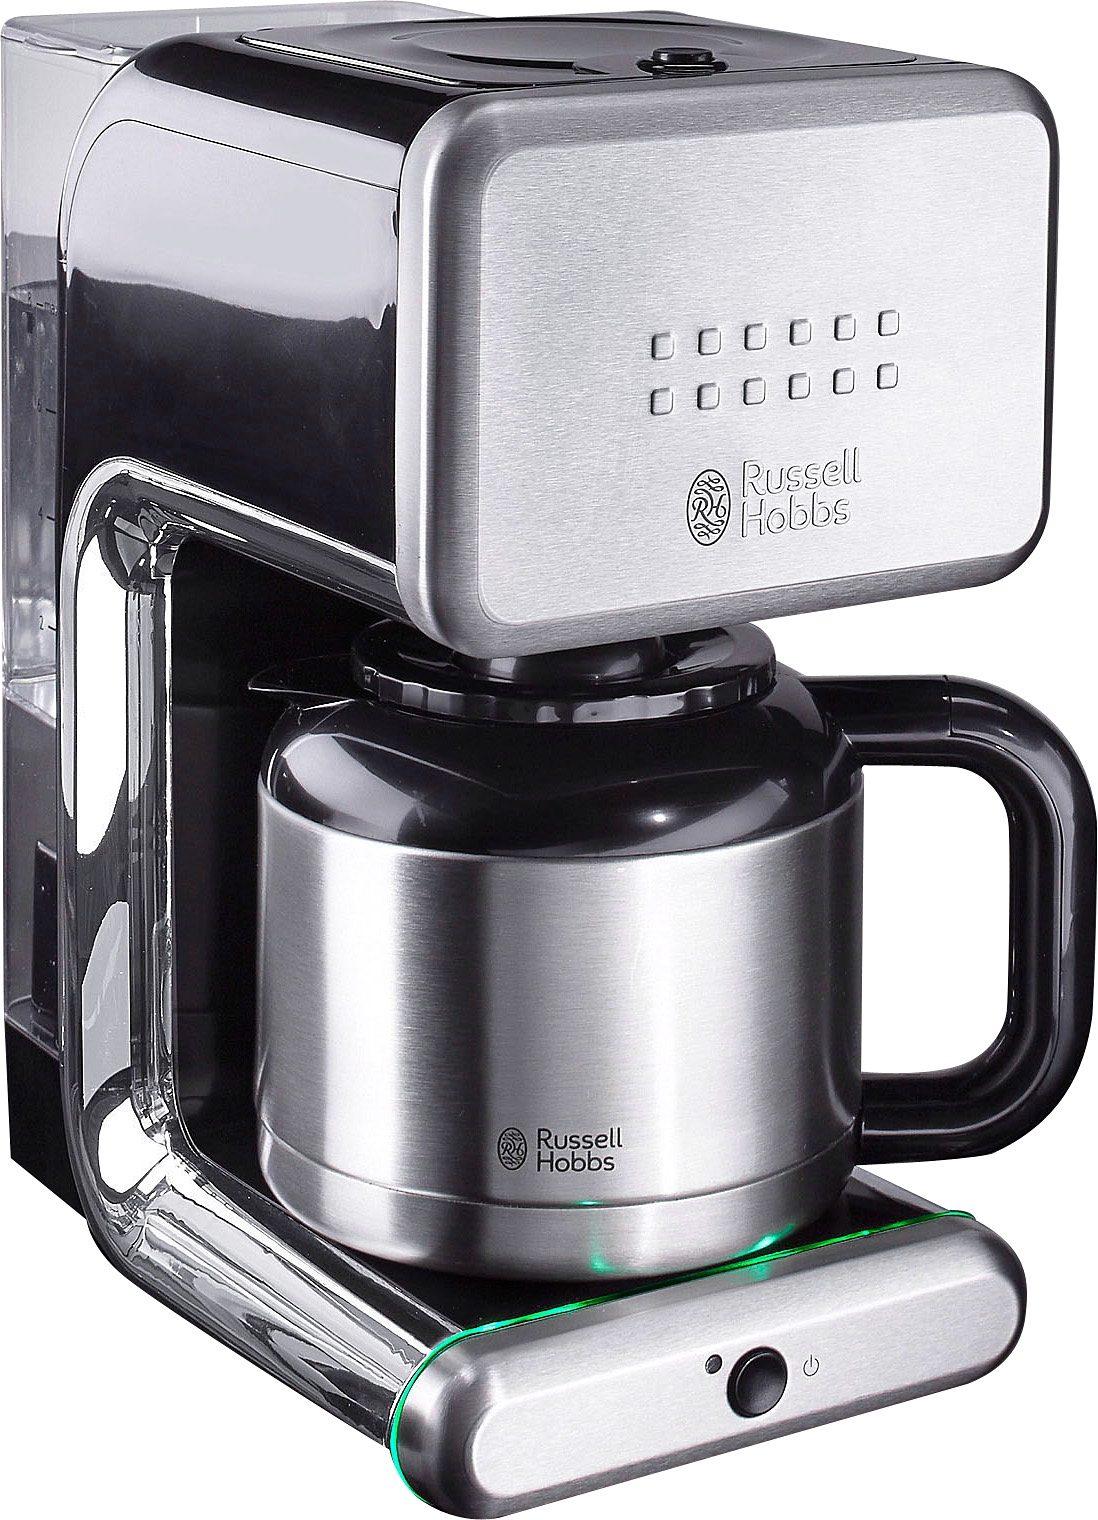 RUSSELL HOBBS Filterkaffeemaschine Illumina 20181-56, 1,1l Kaffeekanne, Papierfilter 1x4